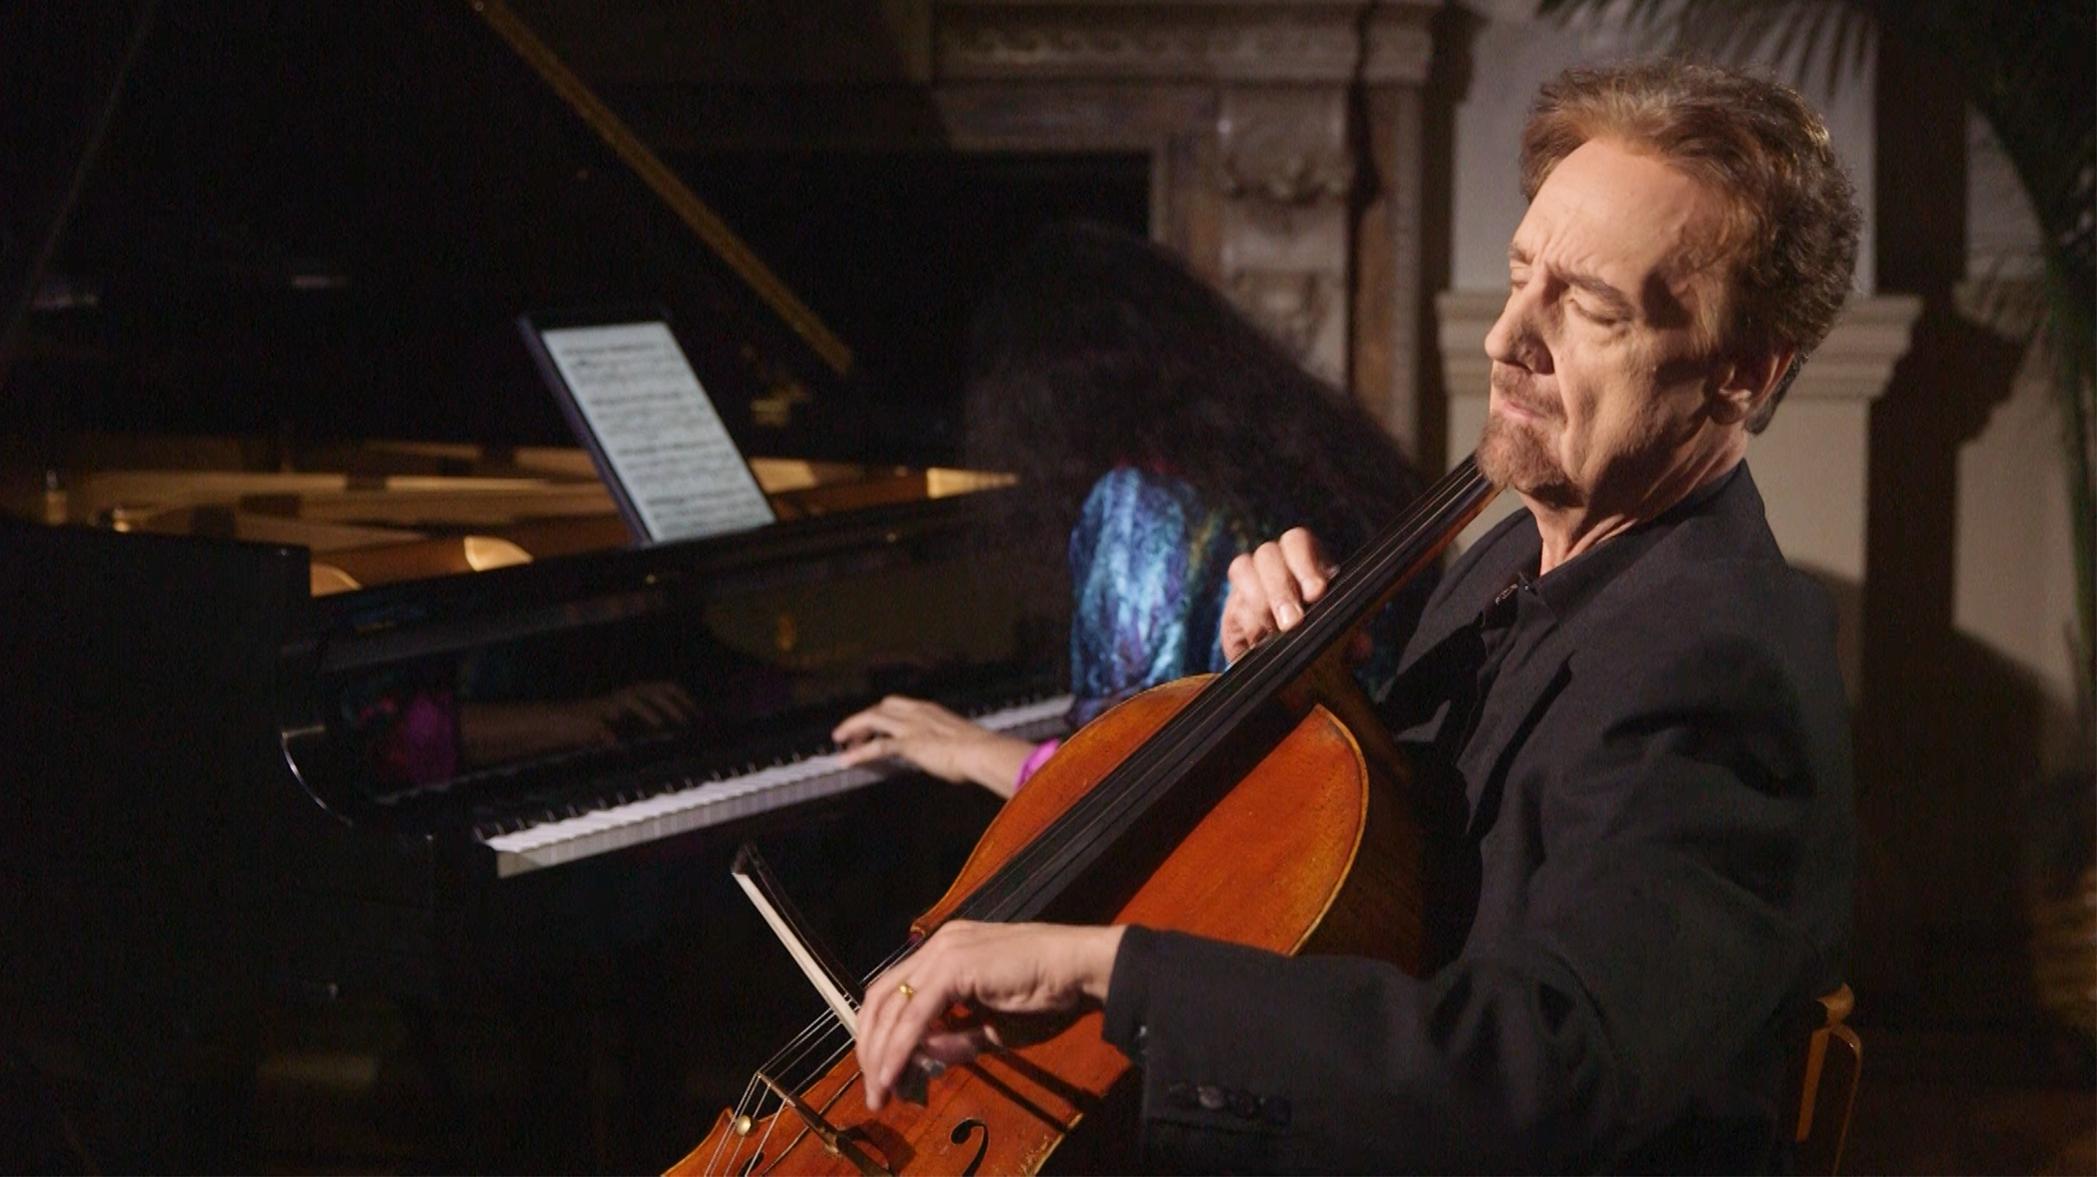 David Finckel: The Chamber Music Maestro - Cellist David Finckel, in concert and conversation with Jim Cotter.Season 4, Episode 13